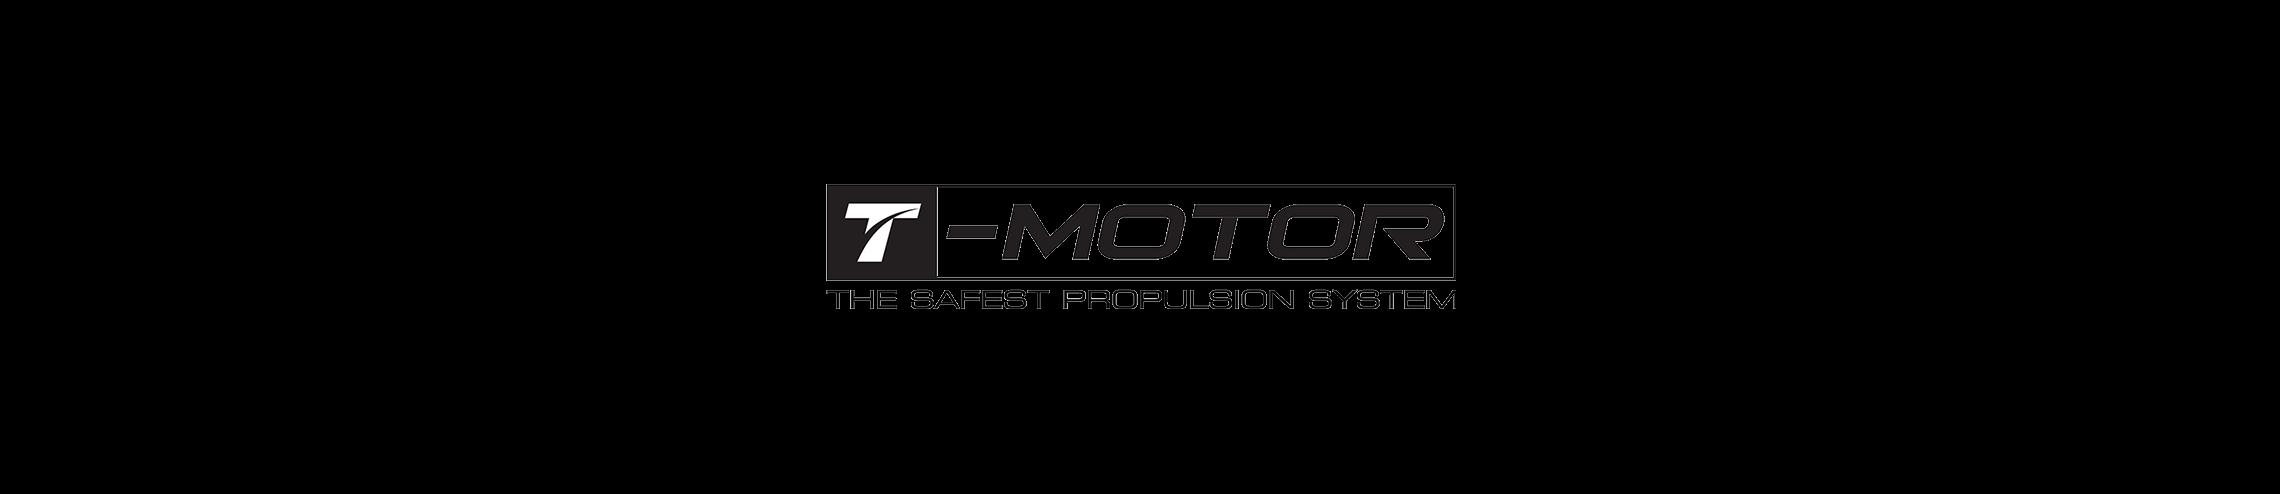 tmotor fpv banner promotion shop description mantisfpv